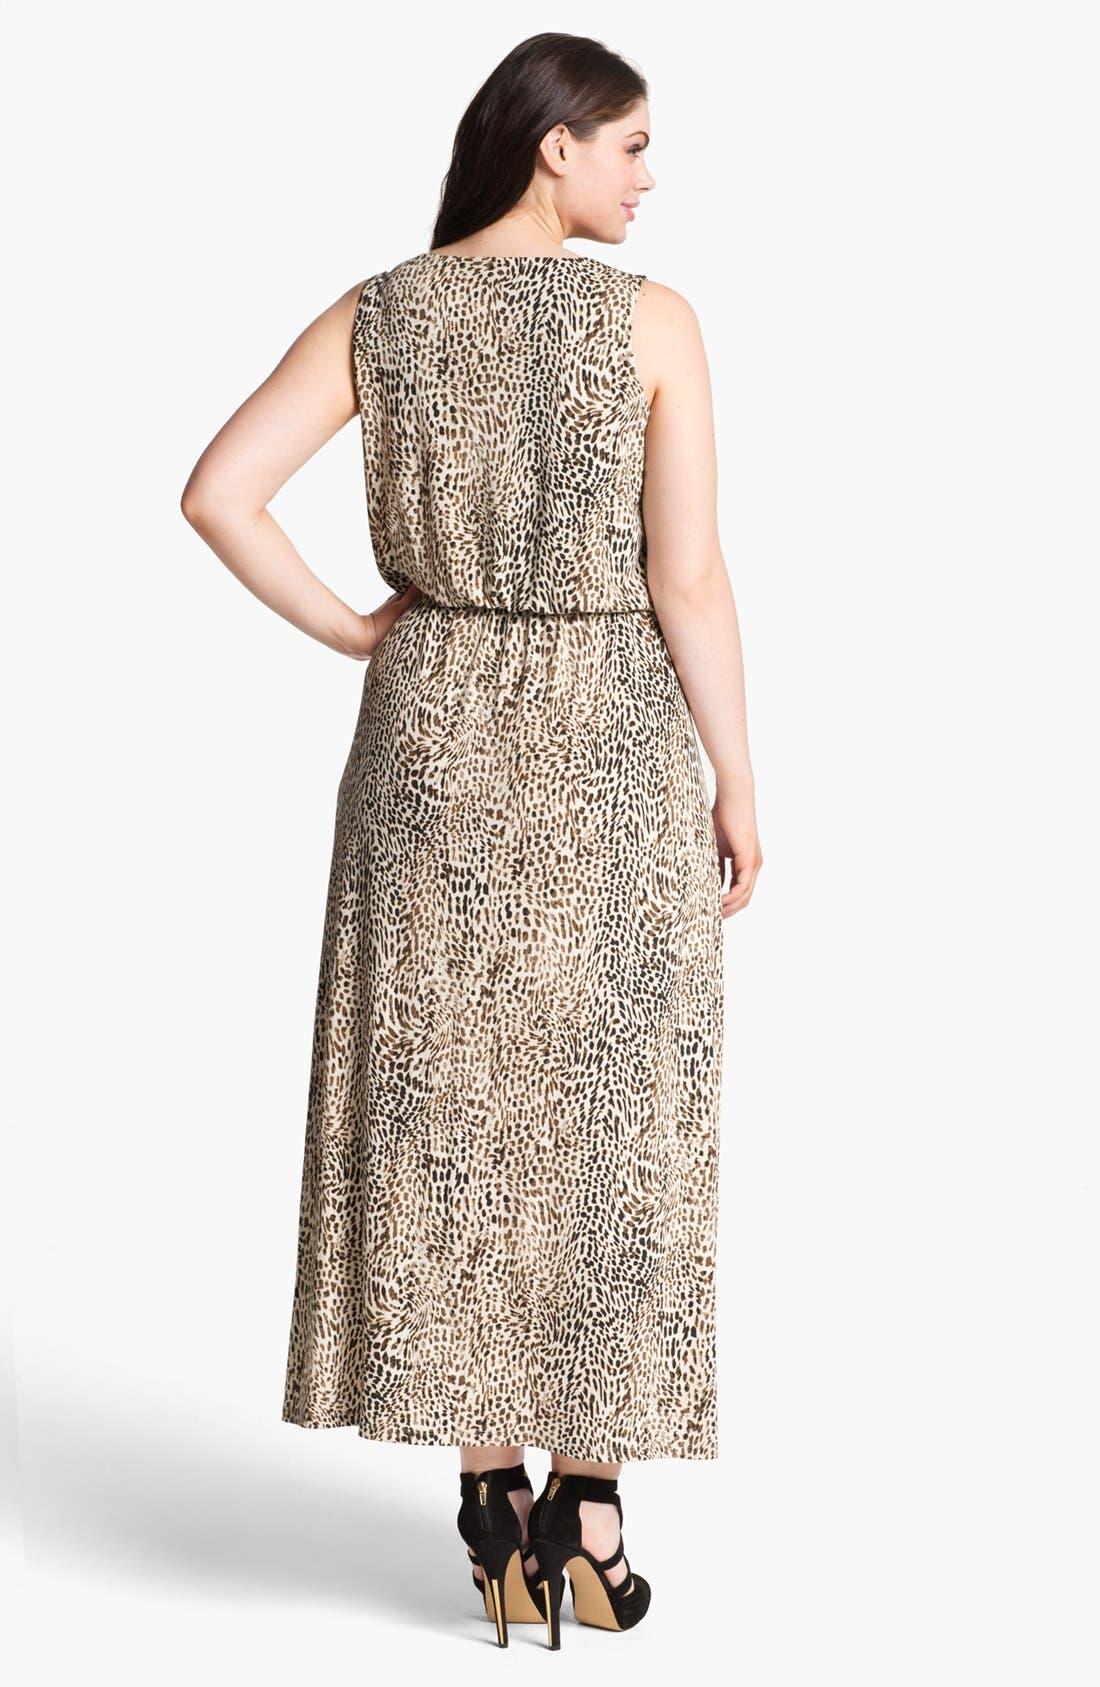 'Rio' Cheetah Print Maxi Dress,                             Alternate thumbnail 2, color,                             271